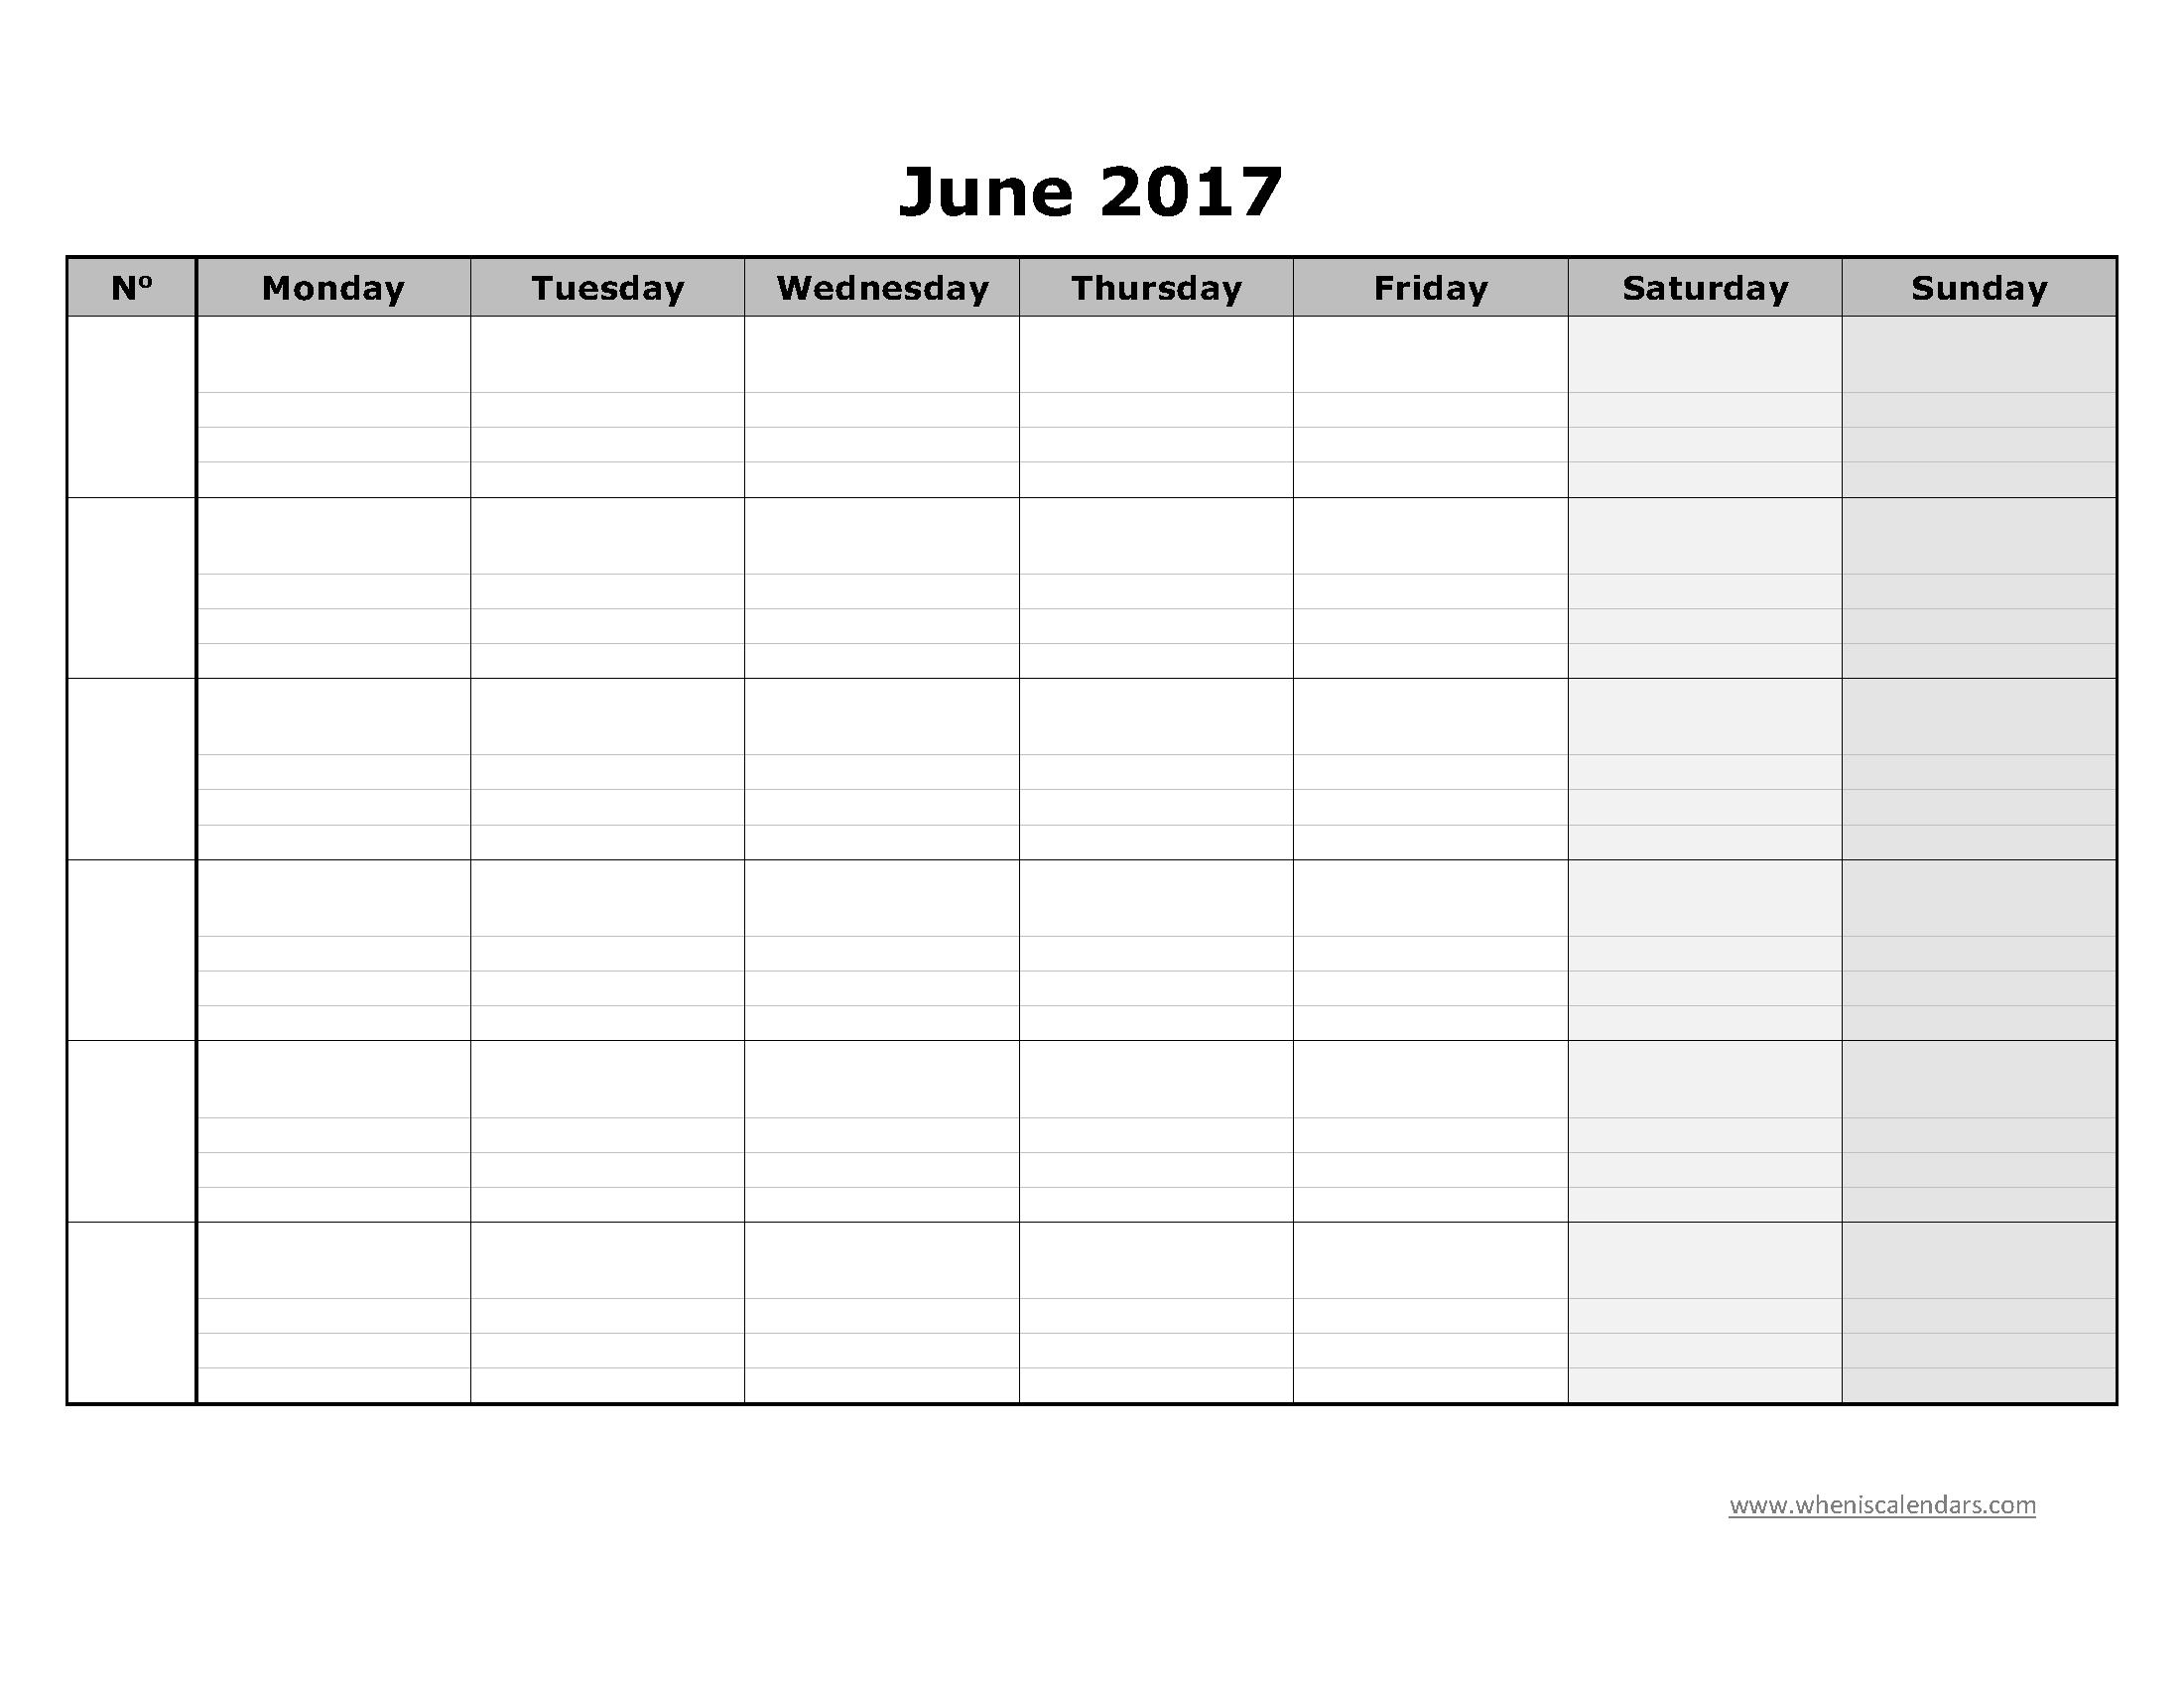 June Calendar 2017 Blank Notes